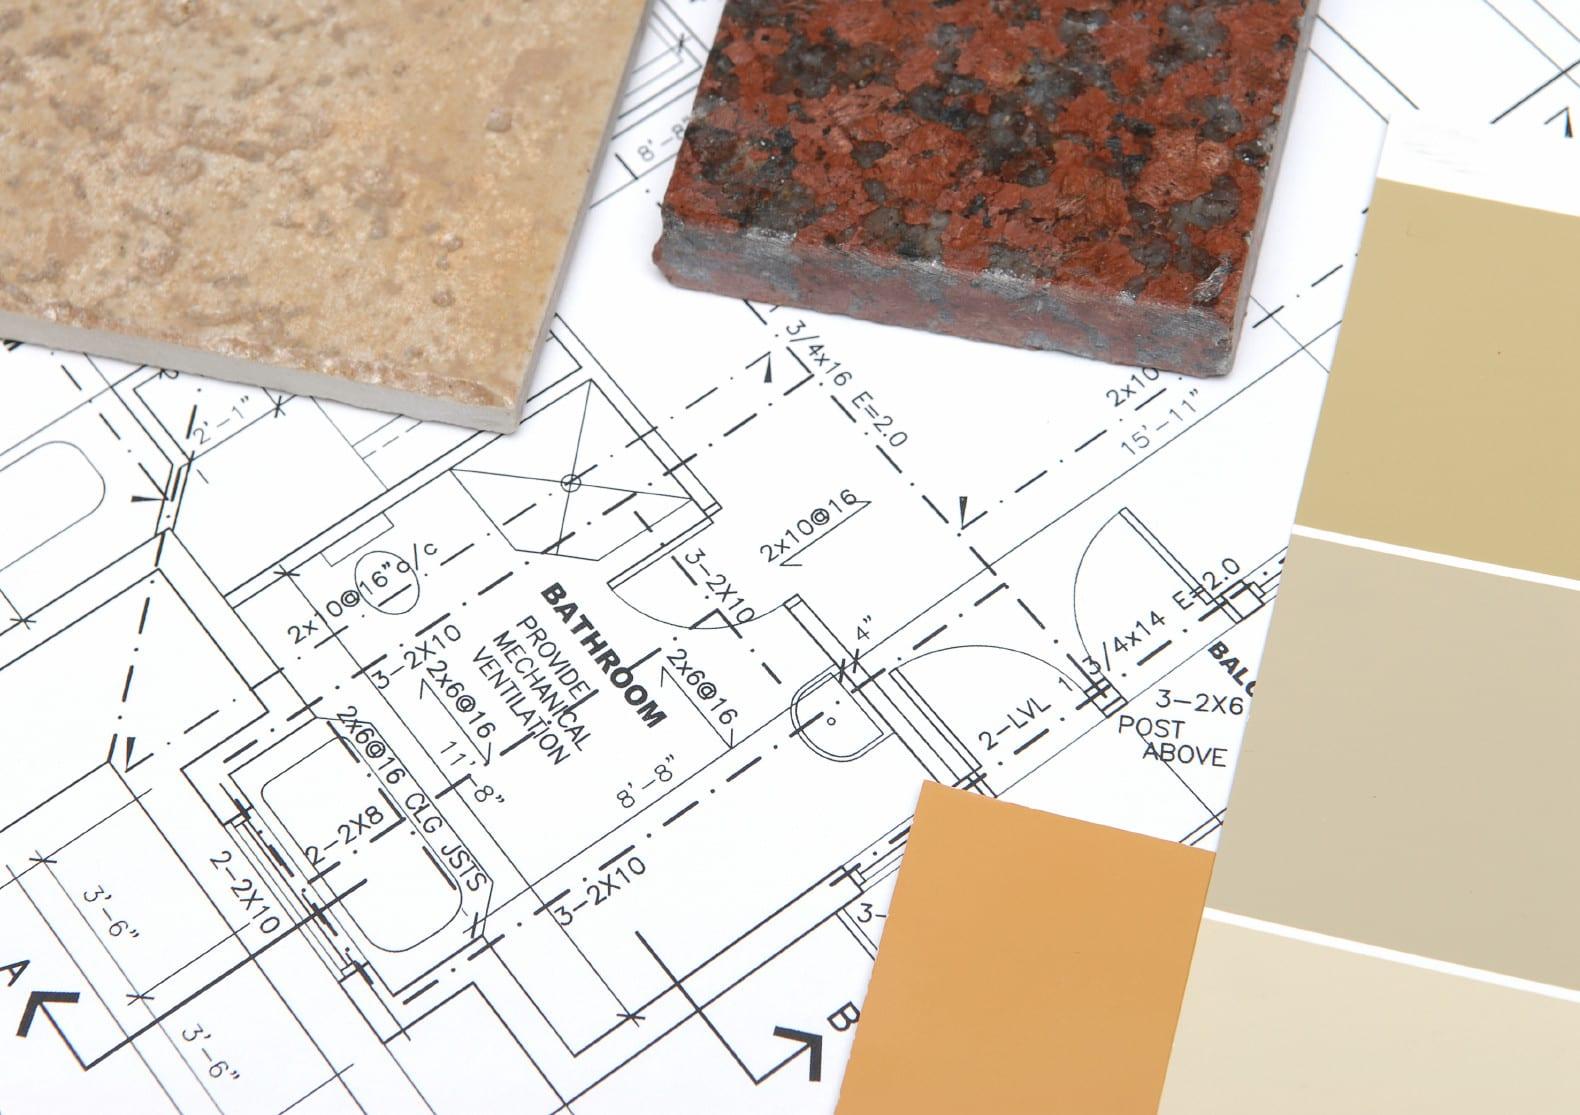 Badsanierung Do It Yourself | Tadelakt Kit For Bathroom Renoval Just ...